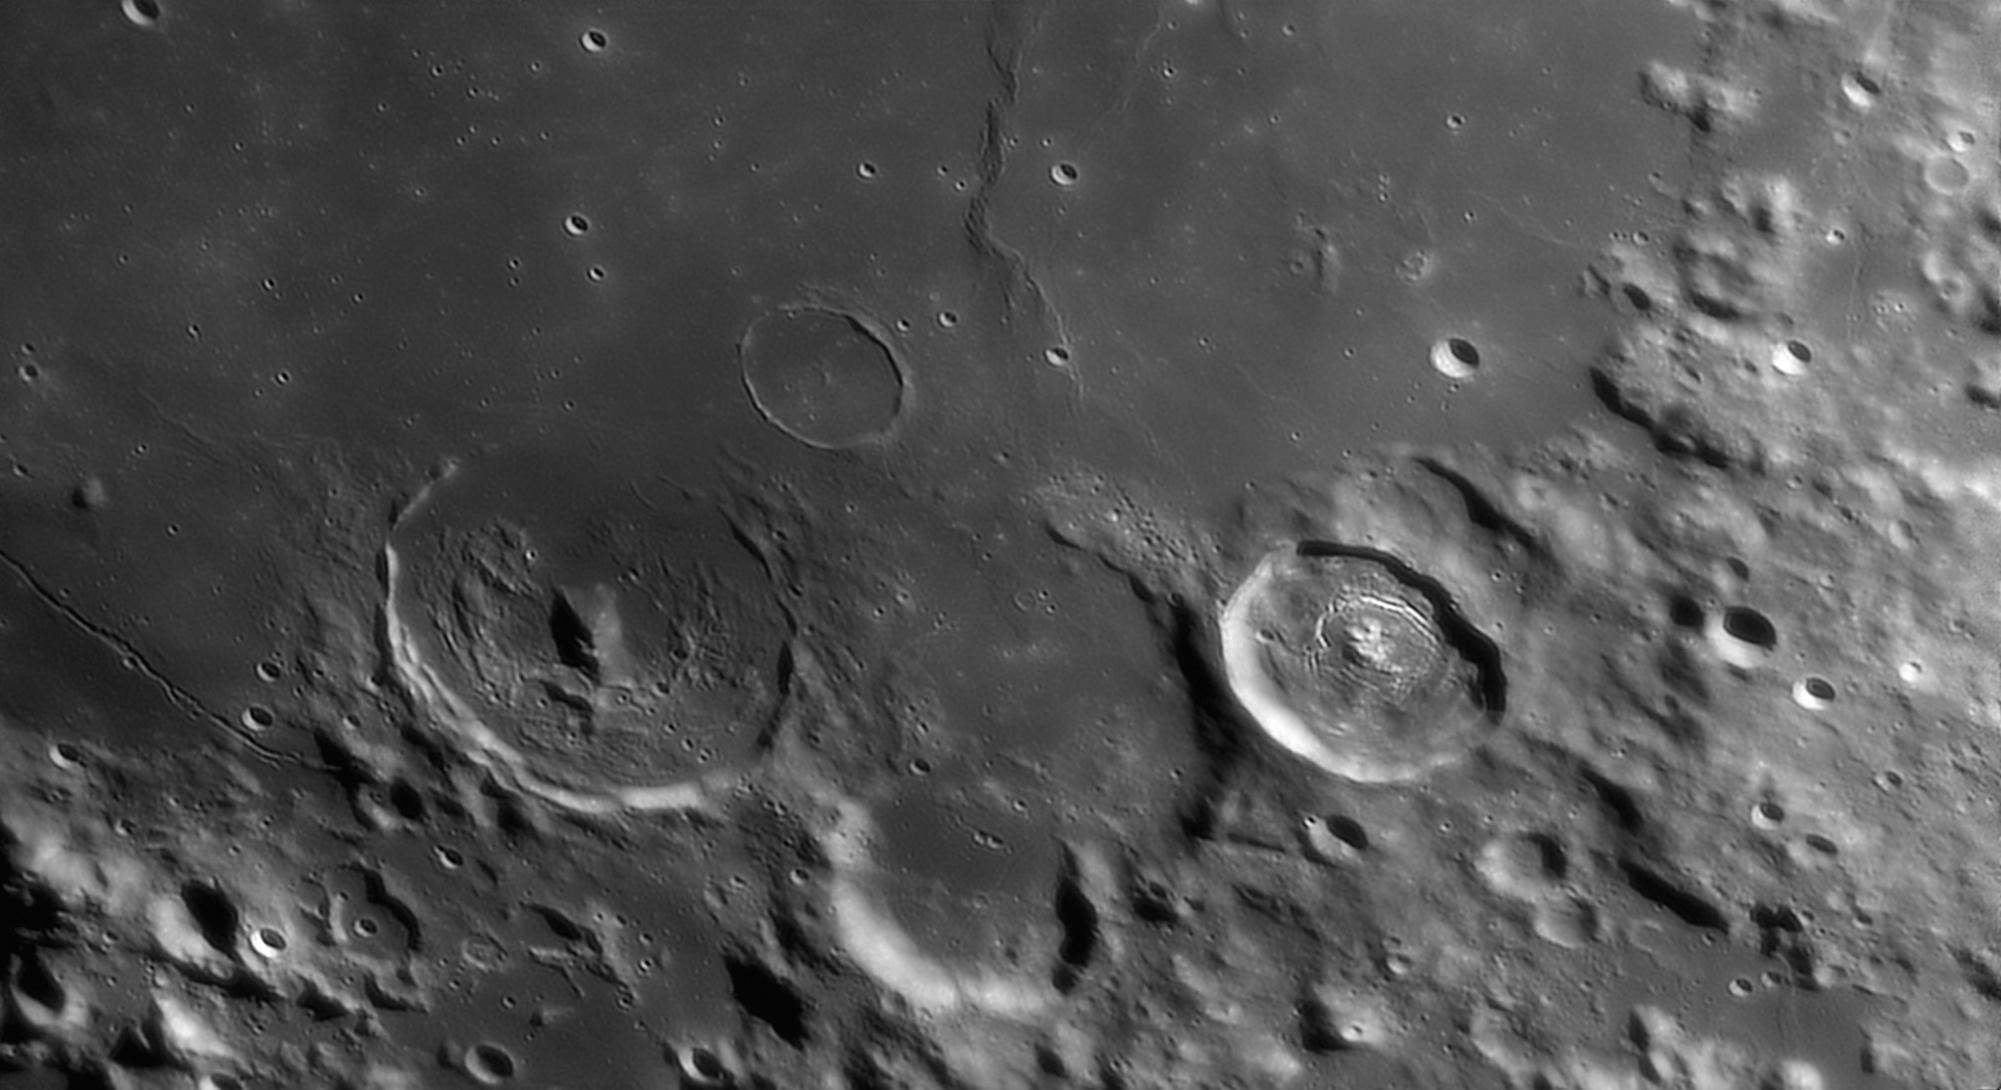 large.2021-02-23-2050_3-R-Moon.jpg.da2dba4c6033066fcbc7f43f3bd3c761.jpg